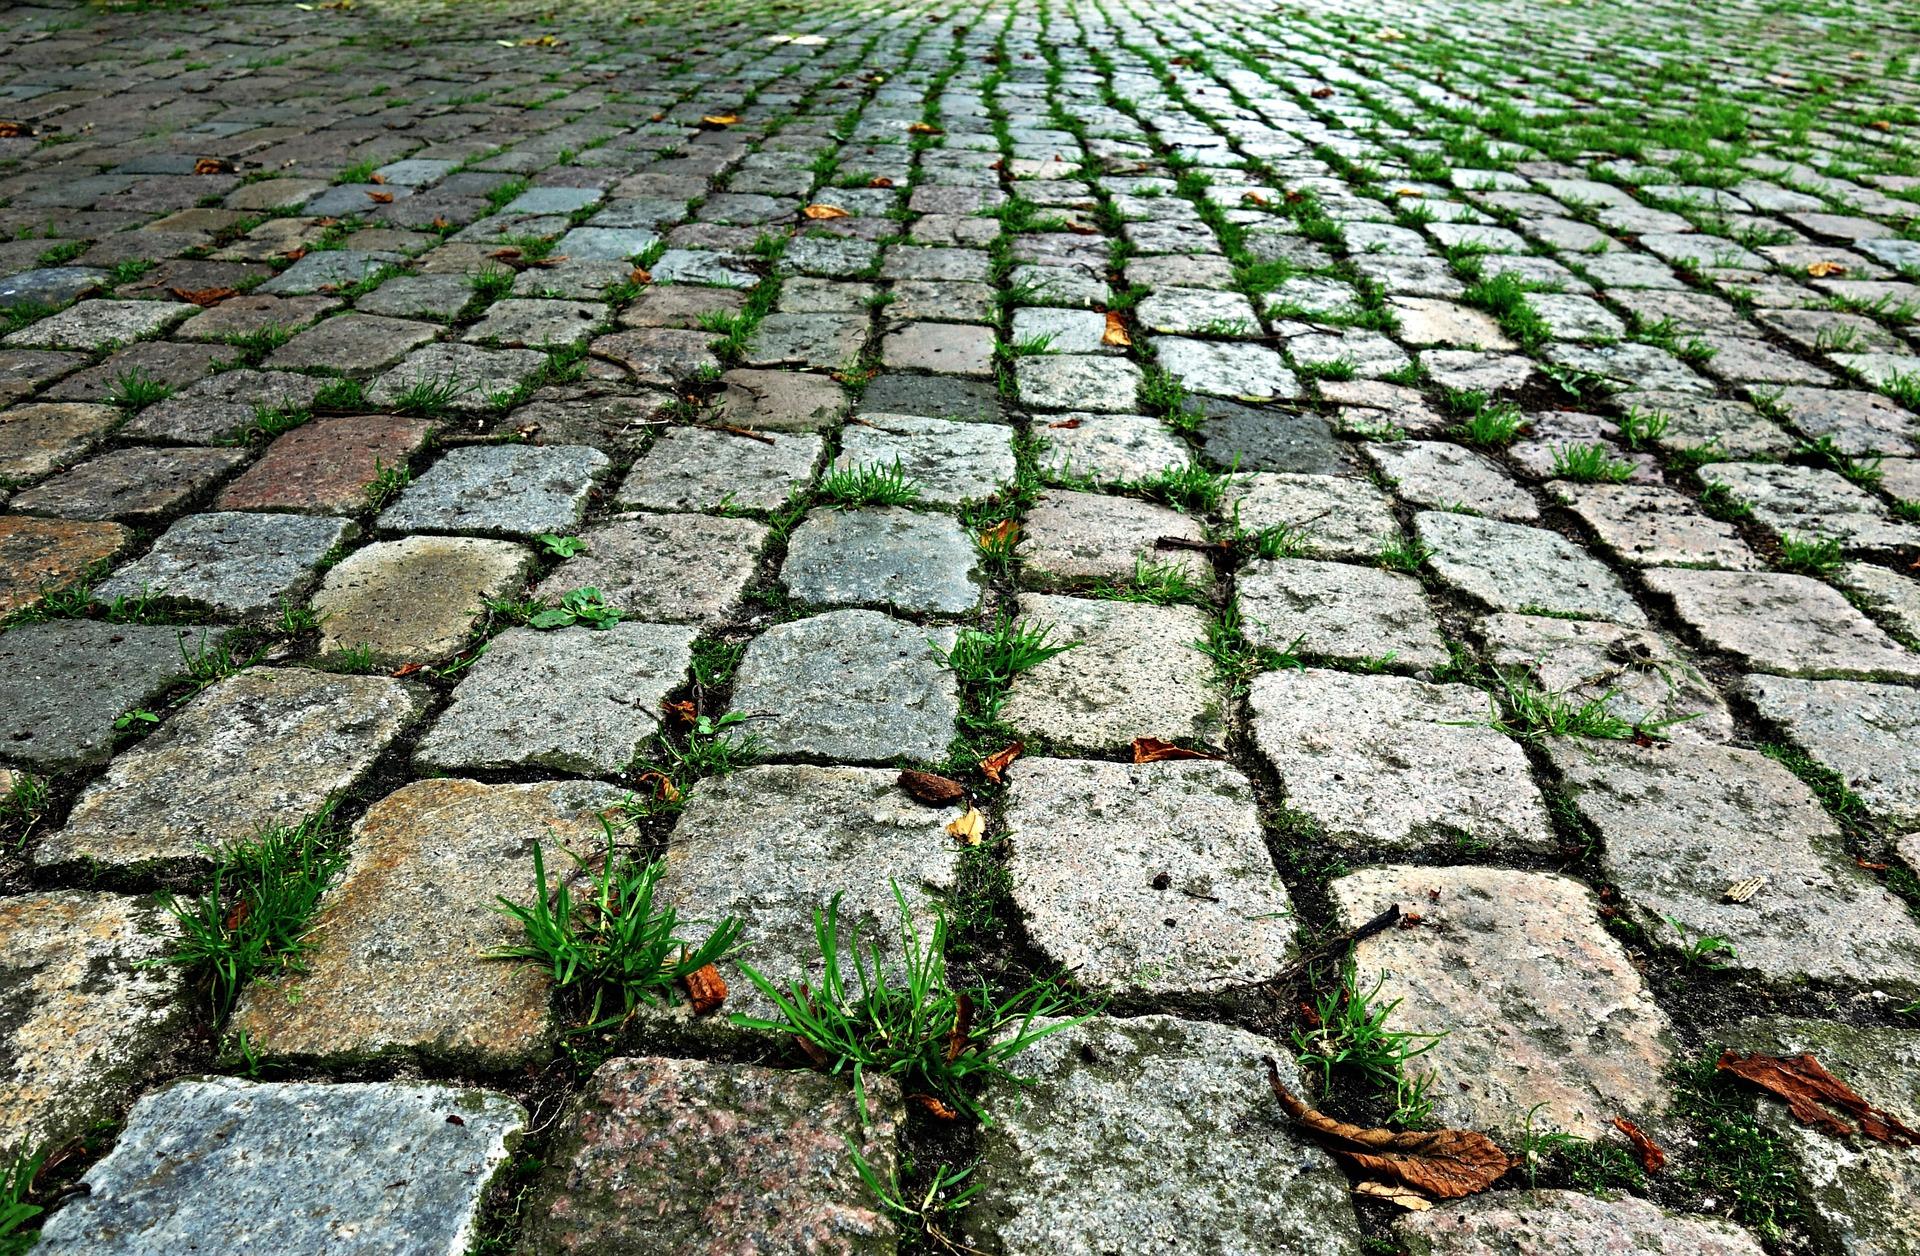 stone-1478110_1920.jpg